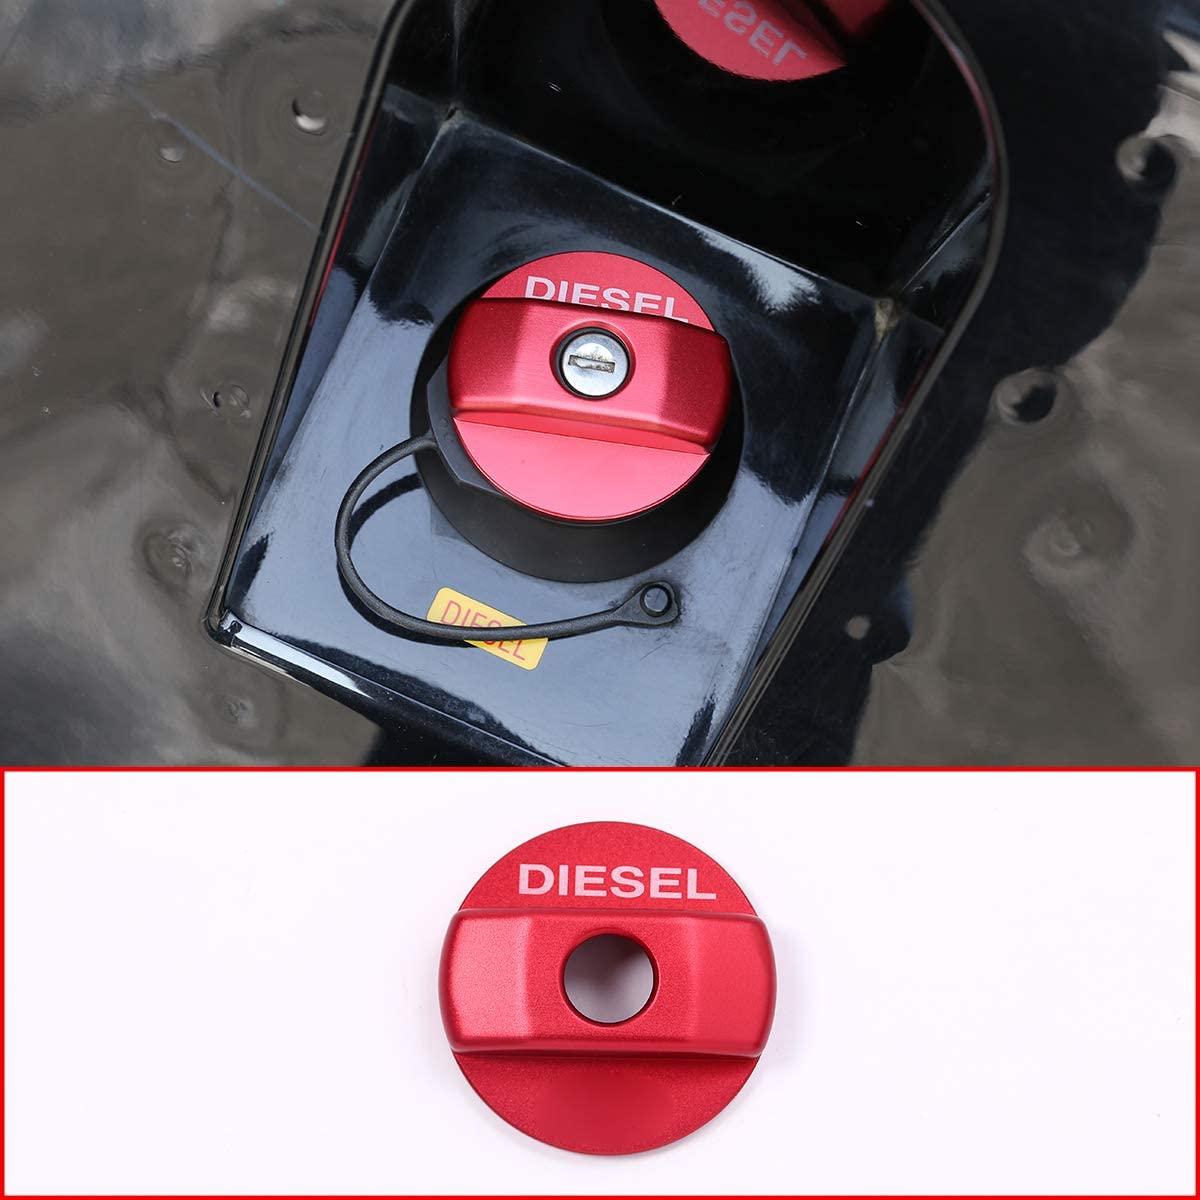 Aluminum alloy Fuel Tank Cap Trim Sticker For Land Rover Defender 90 110 (red)